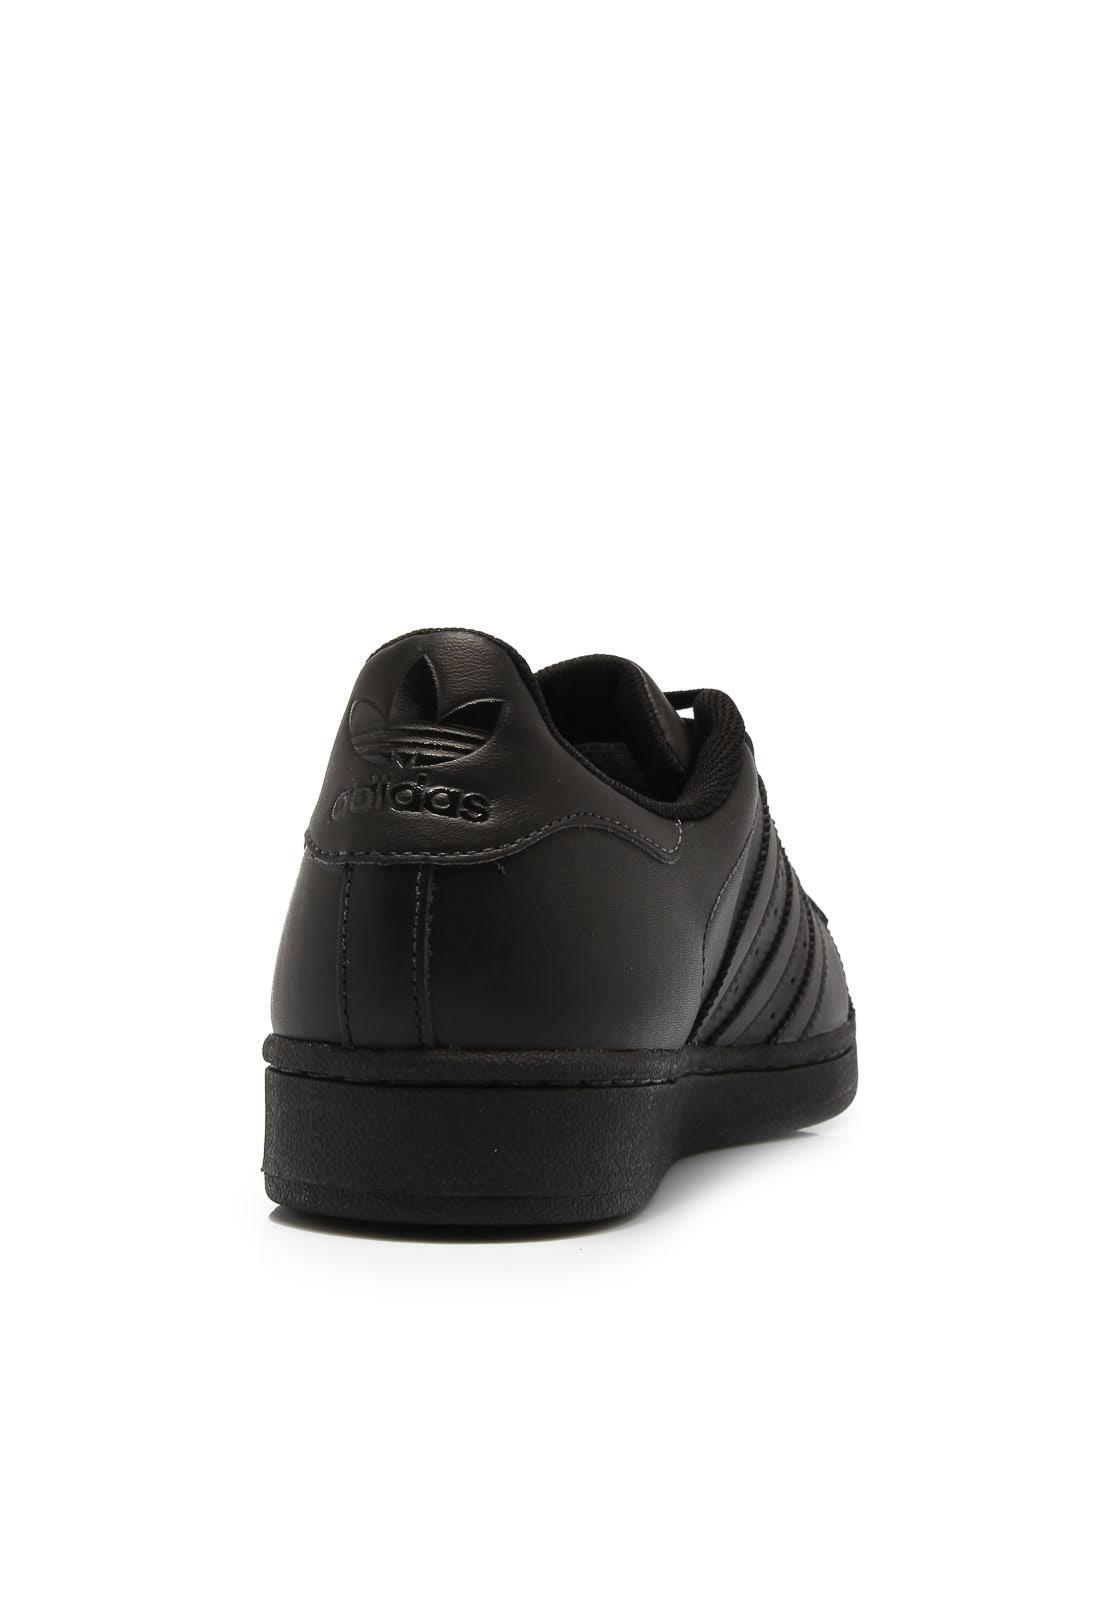 Adidas Uomo BlackLifestyle Tennis Nero Superstar POmNvyn0w8